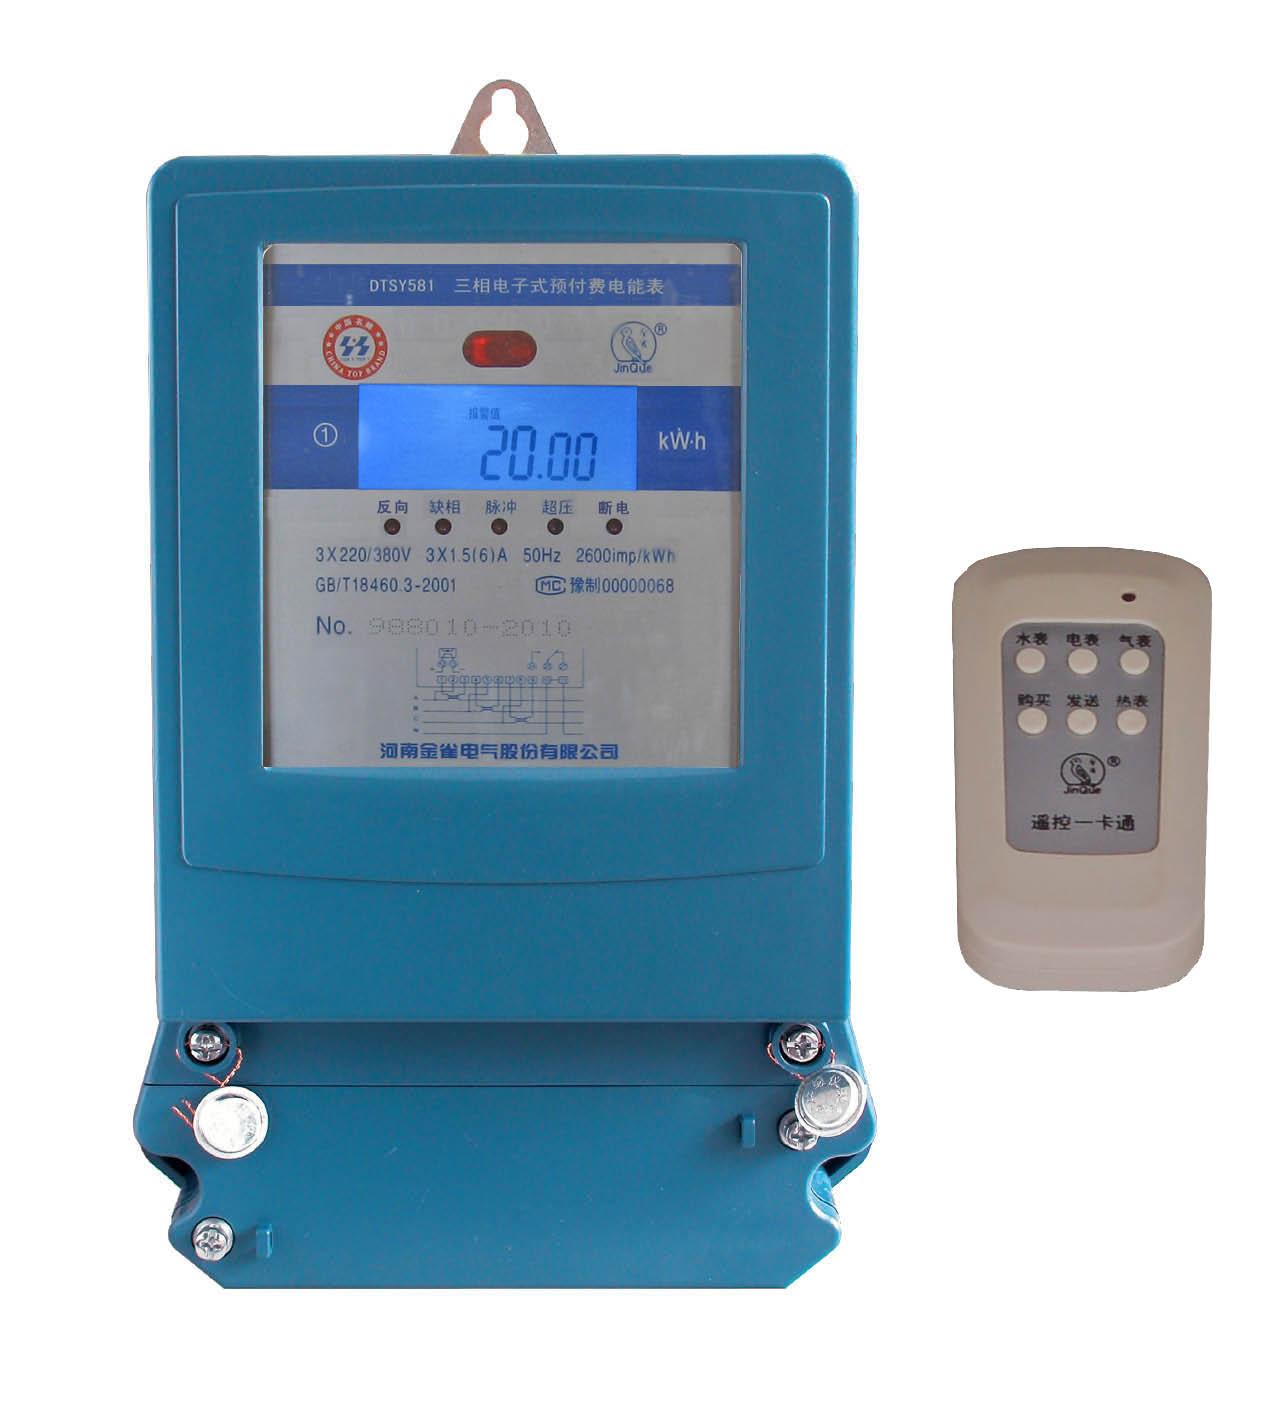 dtsy581-yl型 三相四线电子式预付费电能表